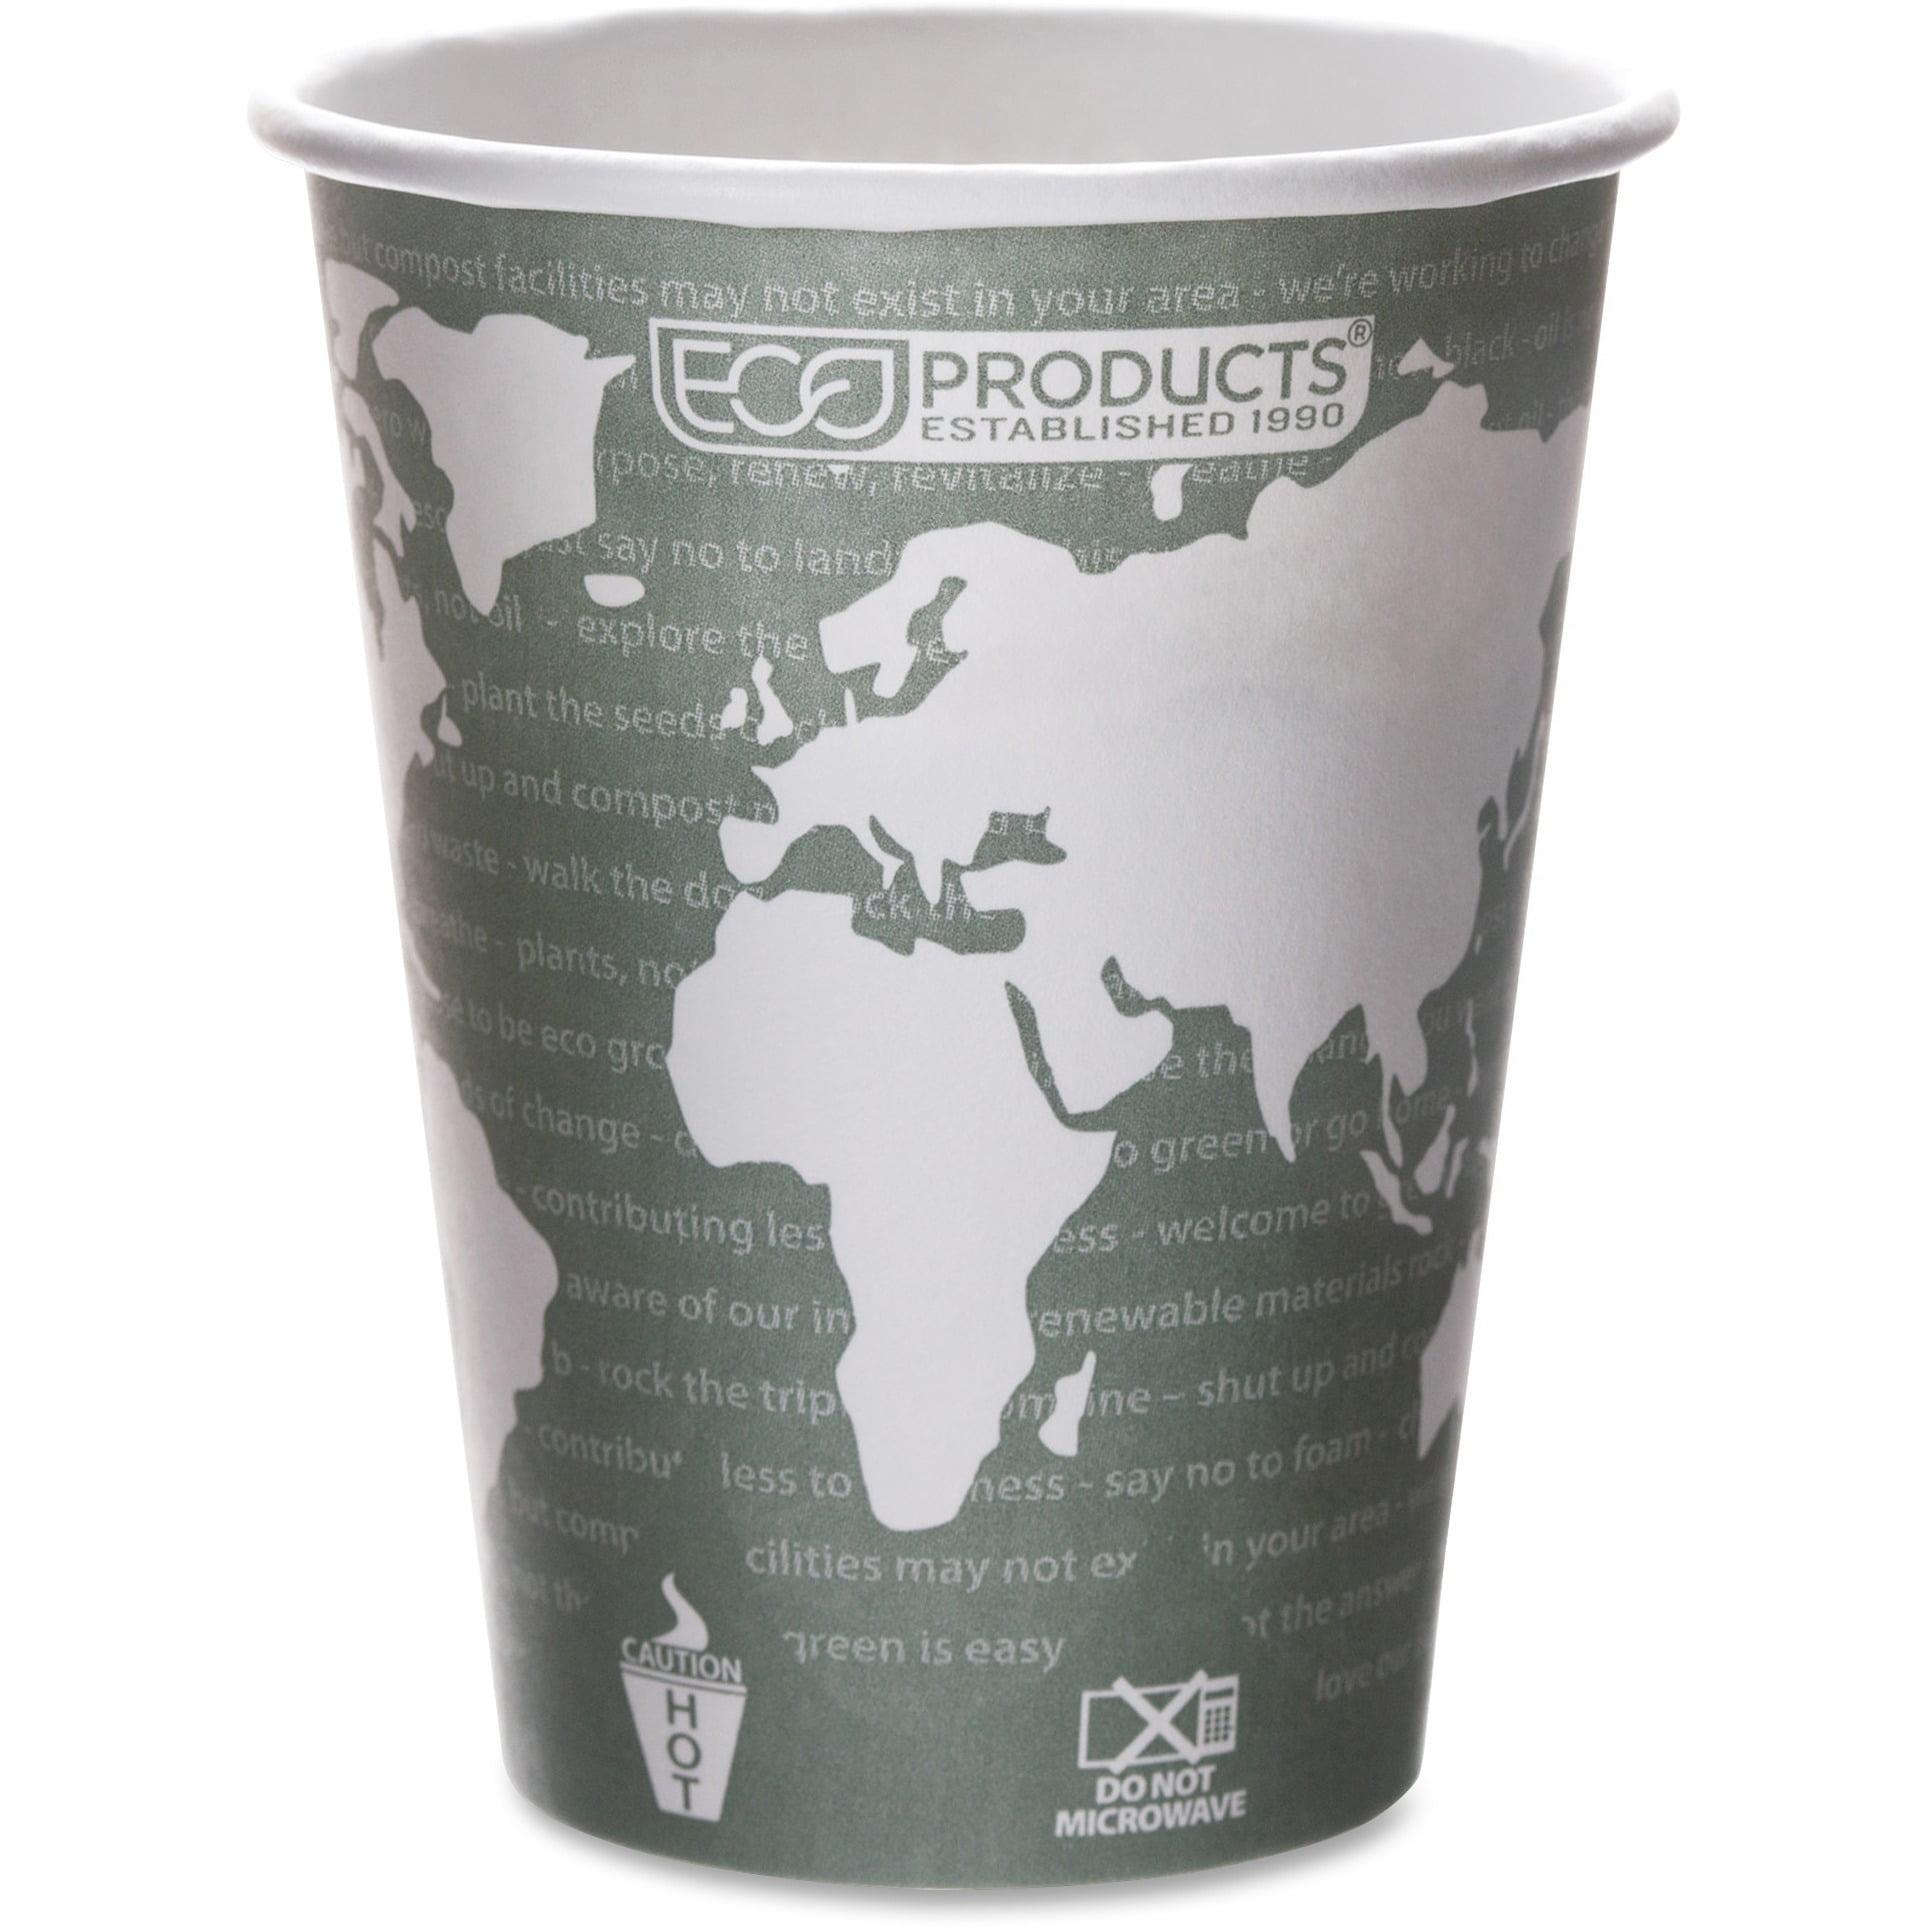 Eco-Products, ECOEPBHC12WAPK, Renewable Resource Hot Drink Cups, 50 / Pack, Multi, 12 fl oz